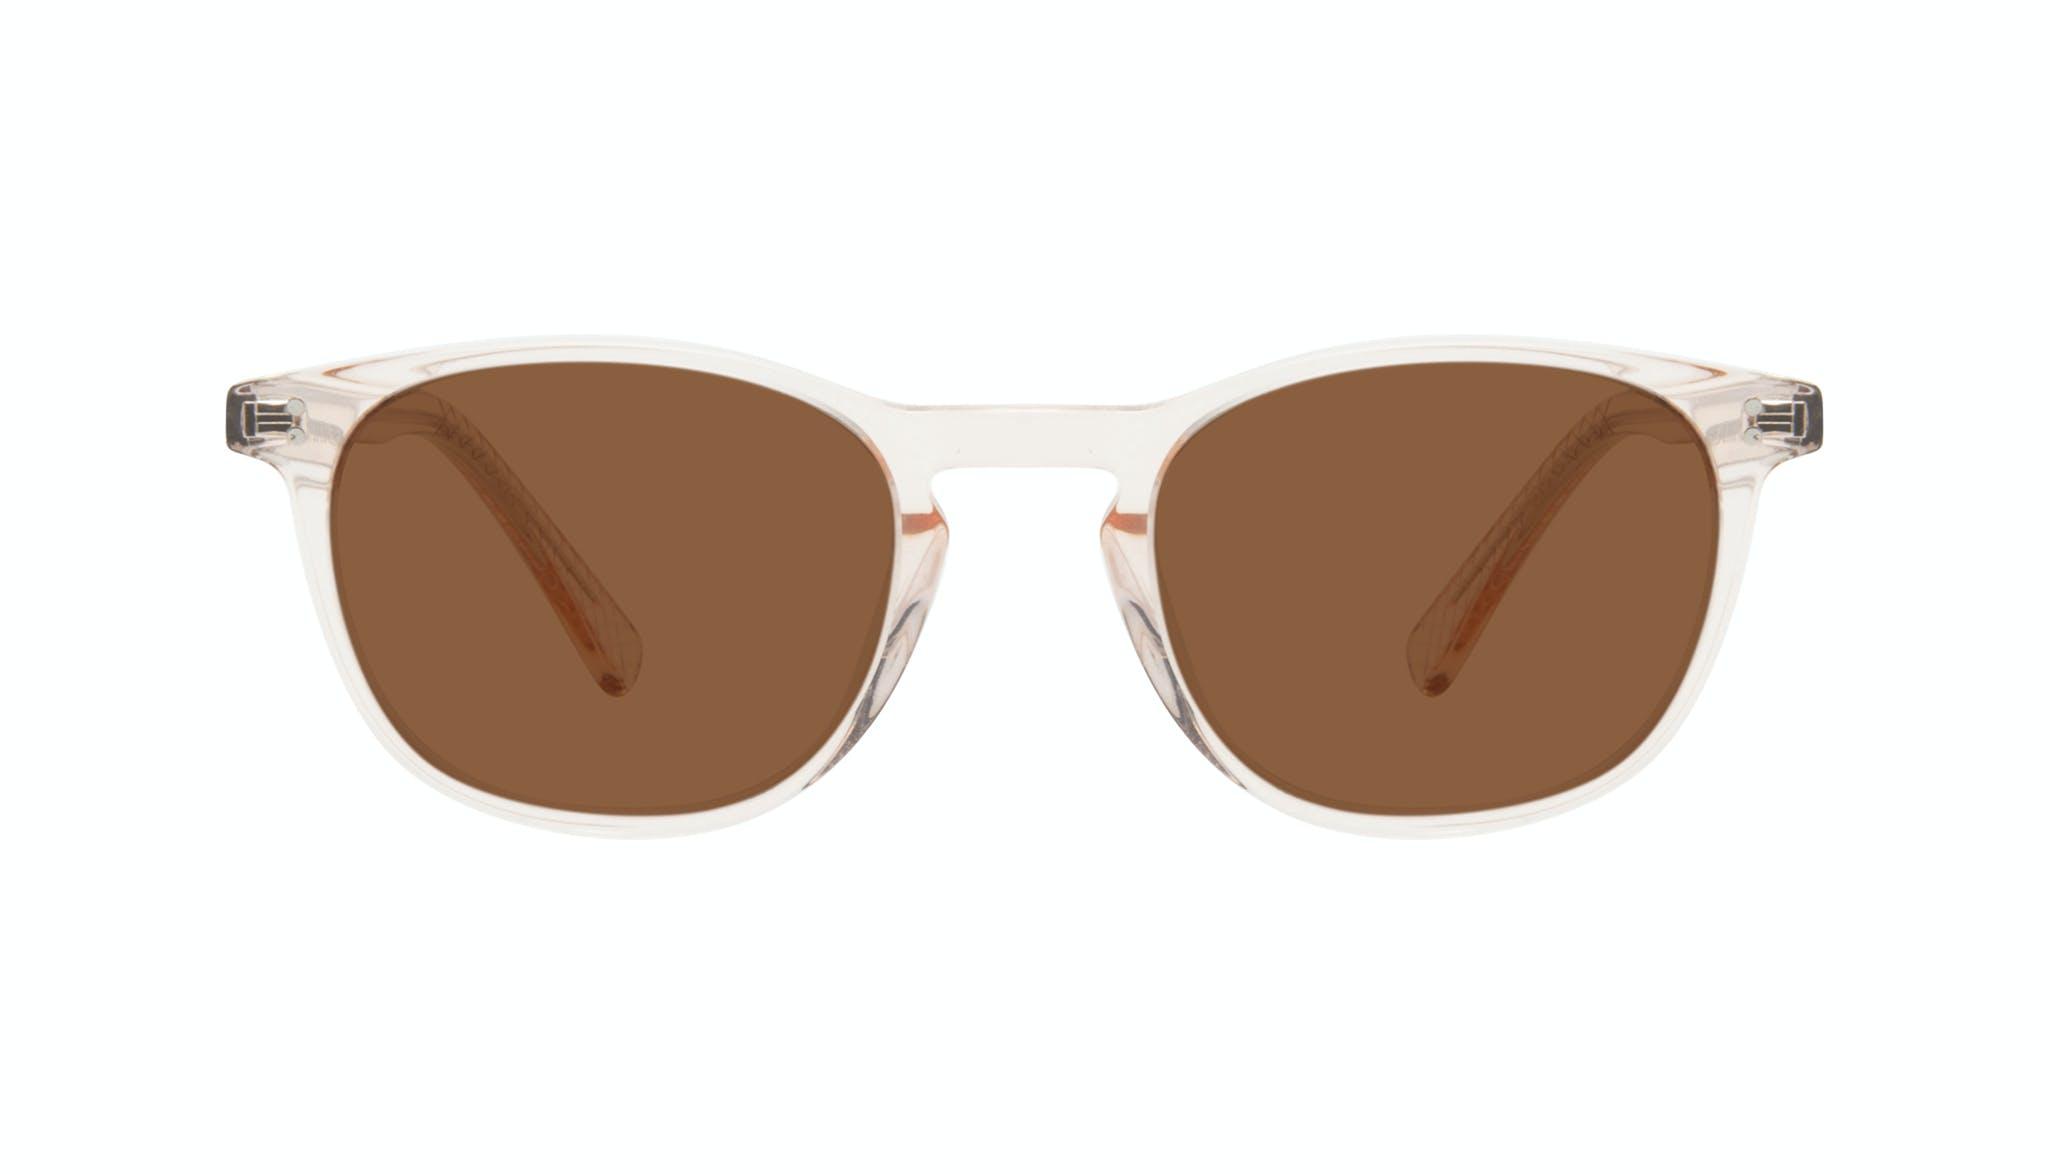 Affordable Fashion Glasses Round Sunglasses Men Trooper Golden